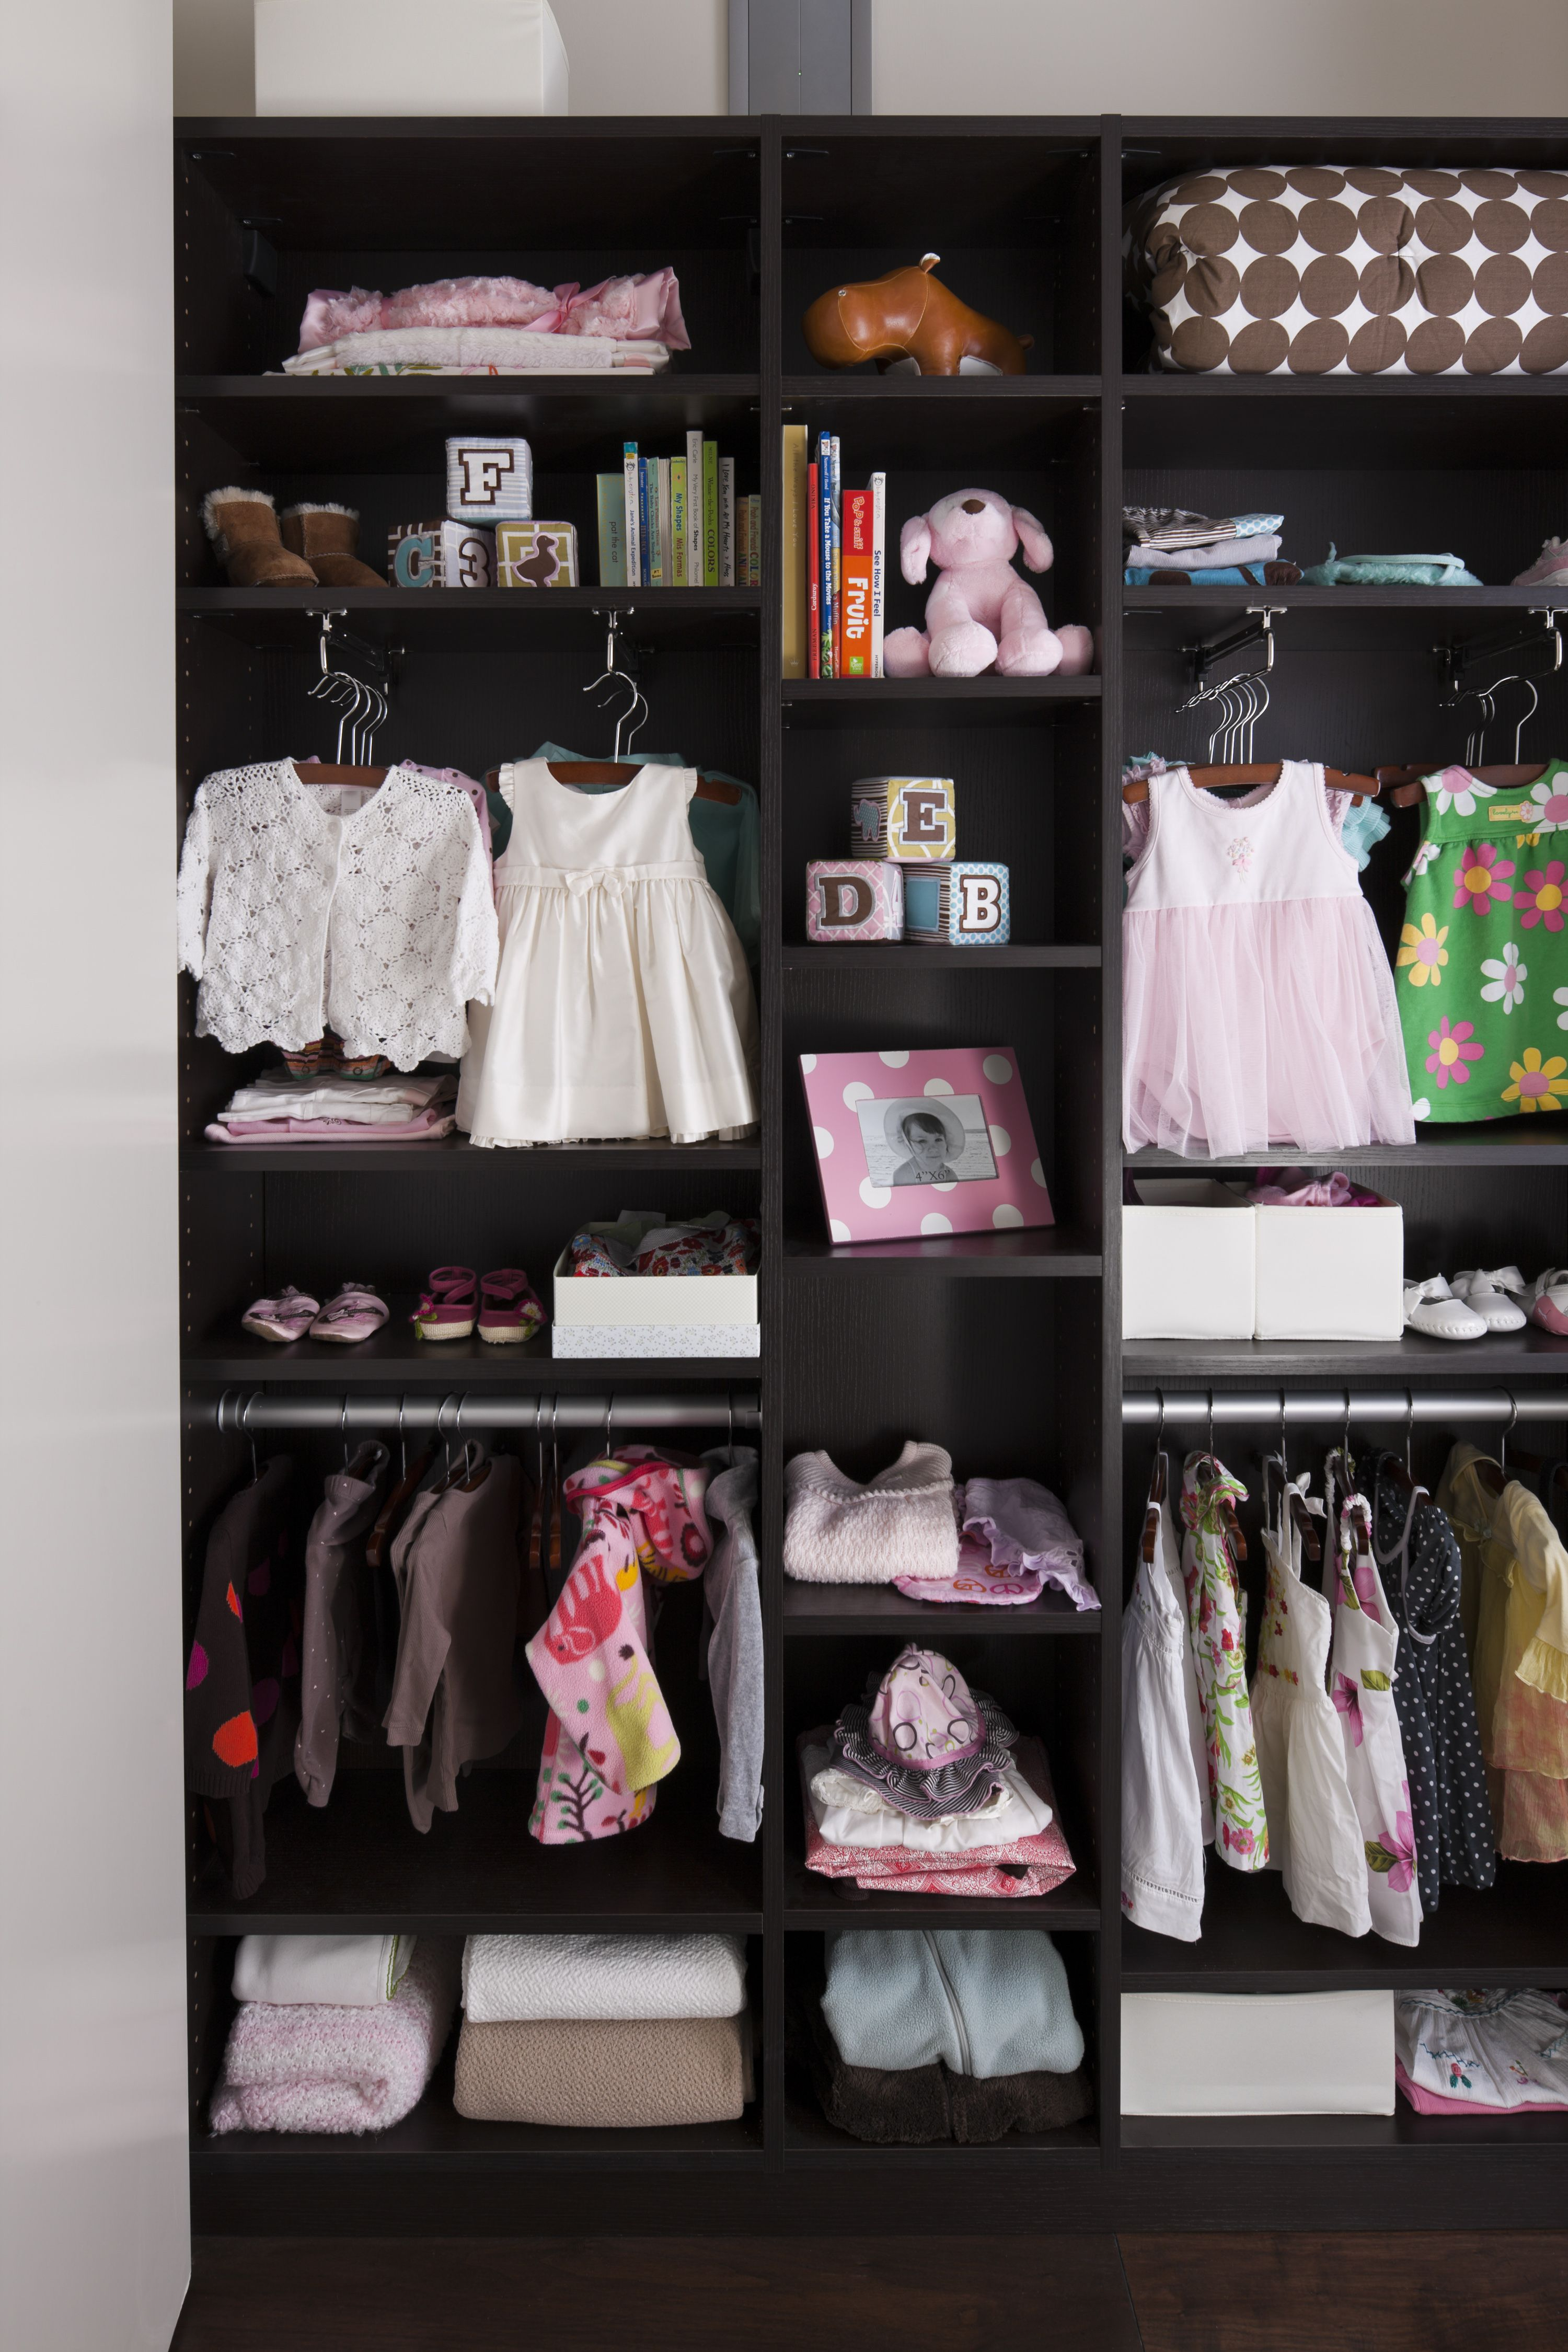 Reach In Closet By California Closets Bebe Pinterest  # Habia Vez Muebles Infantiles Medellin